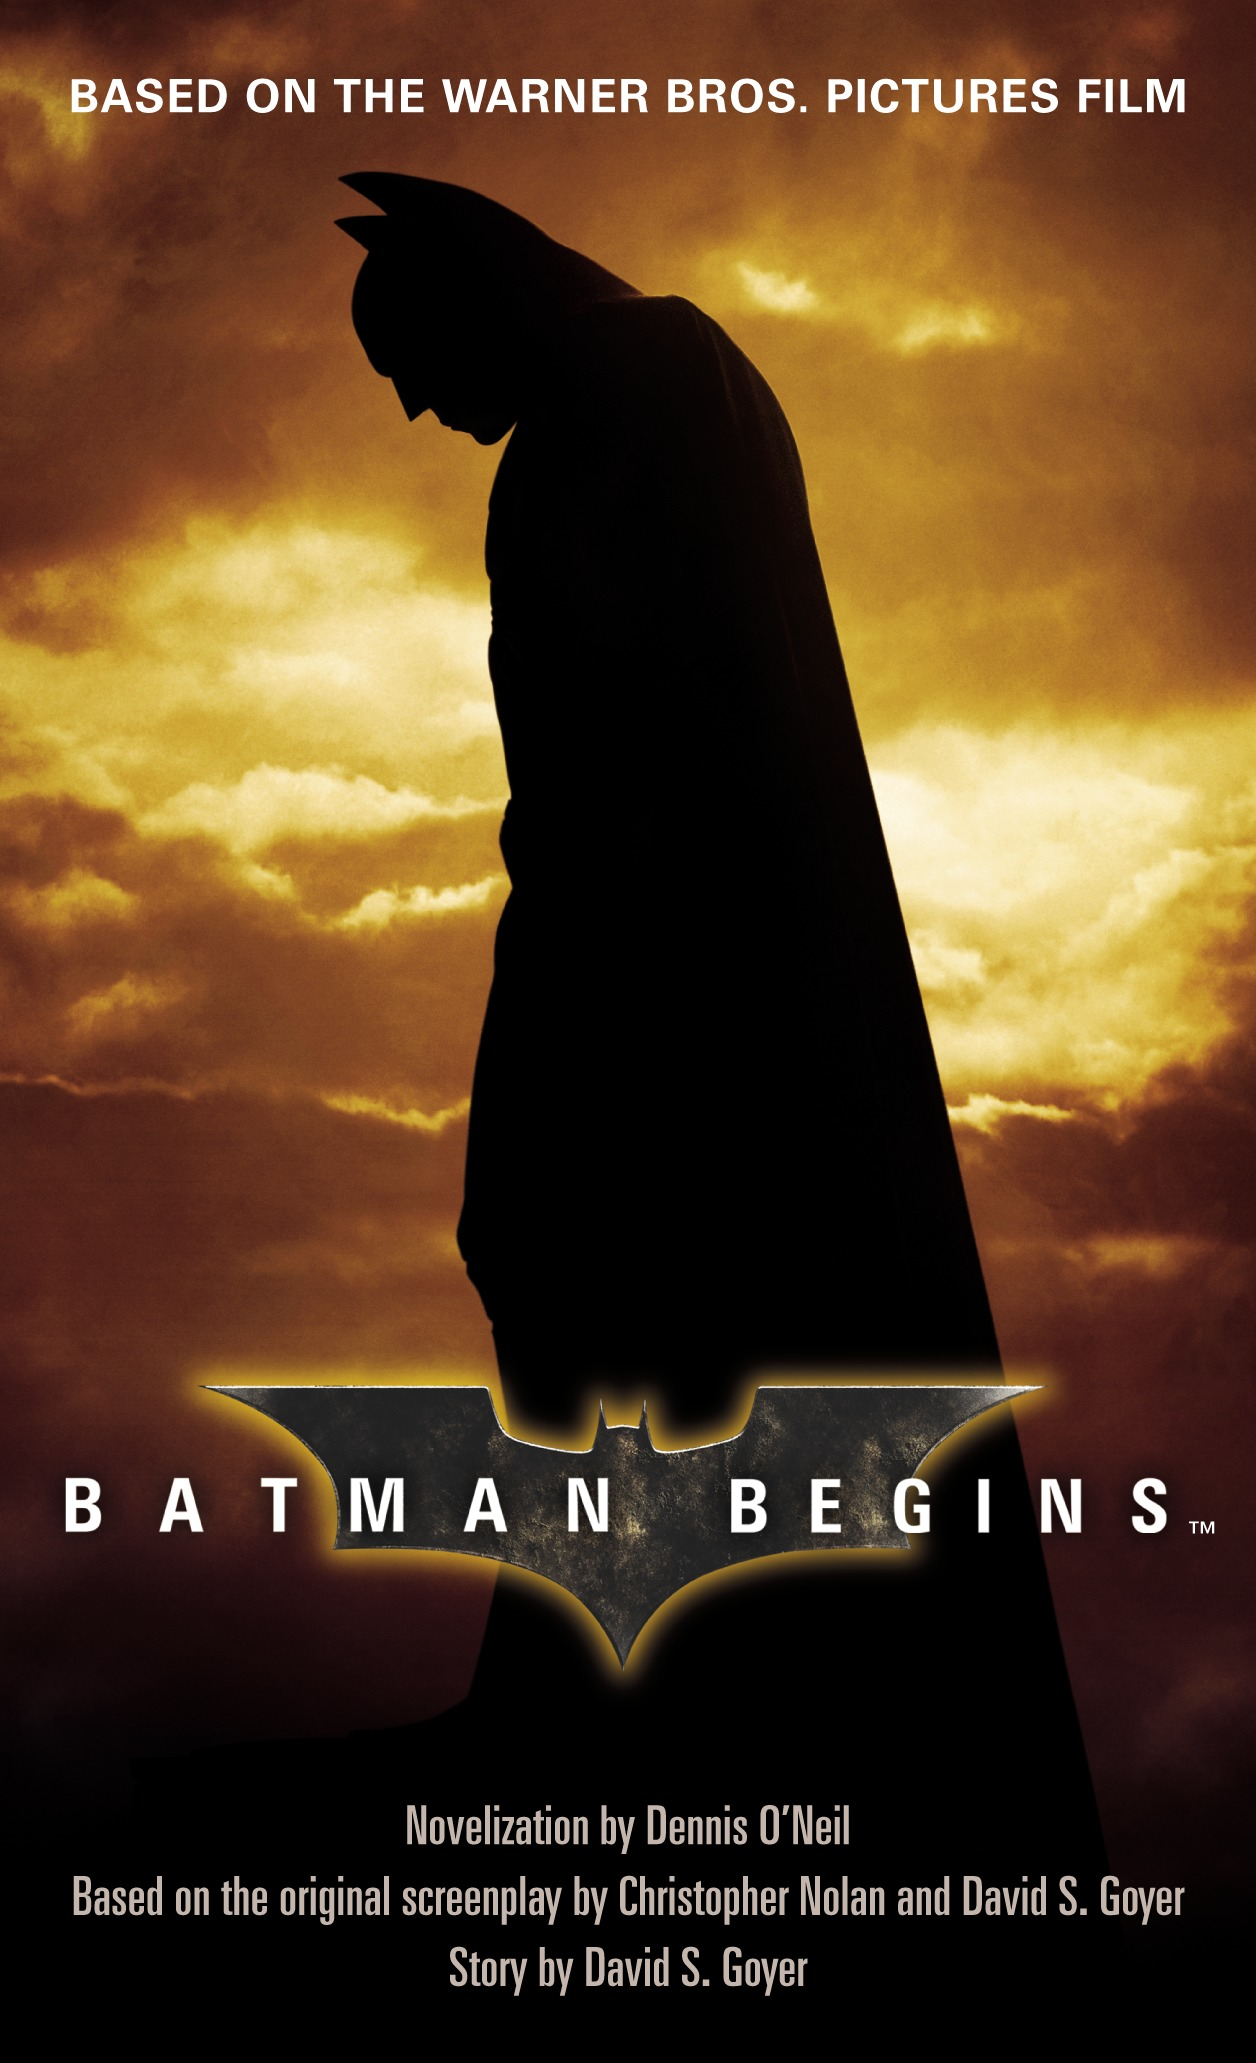 Batman Begins - Novelzation